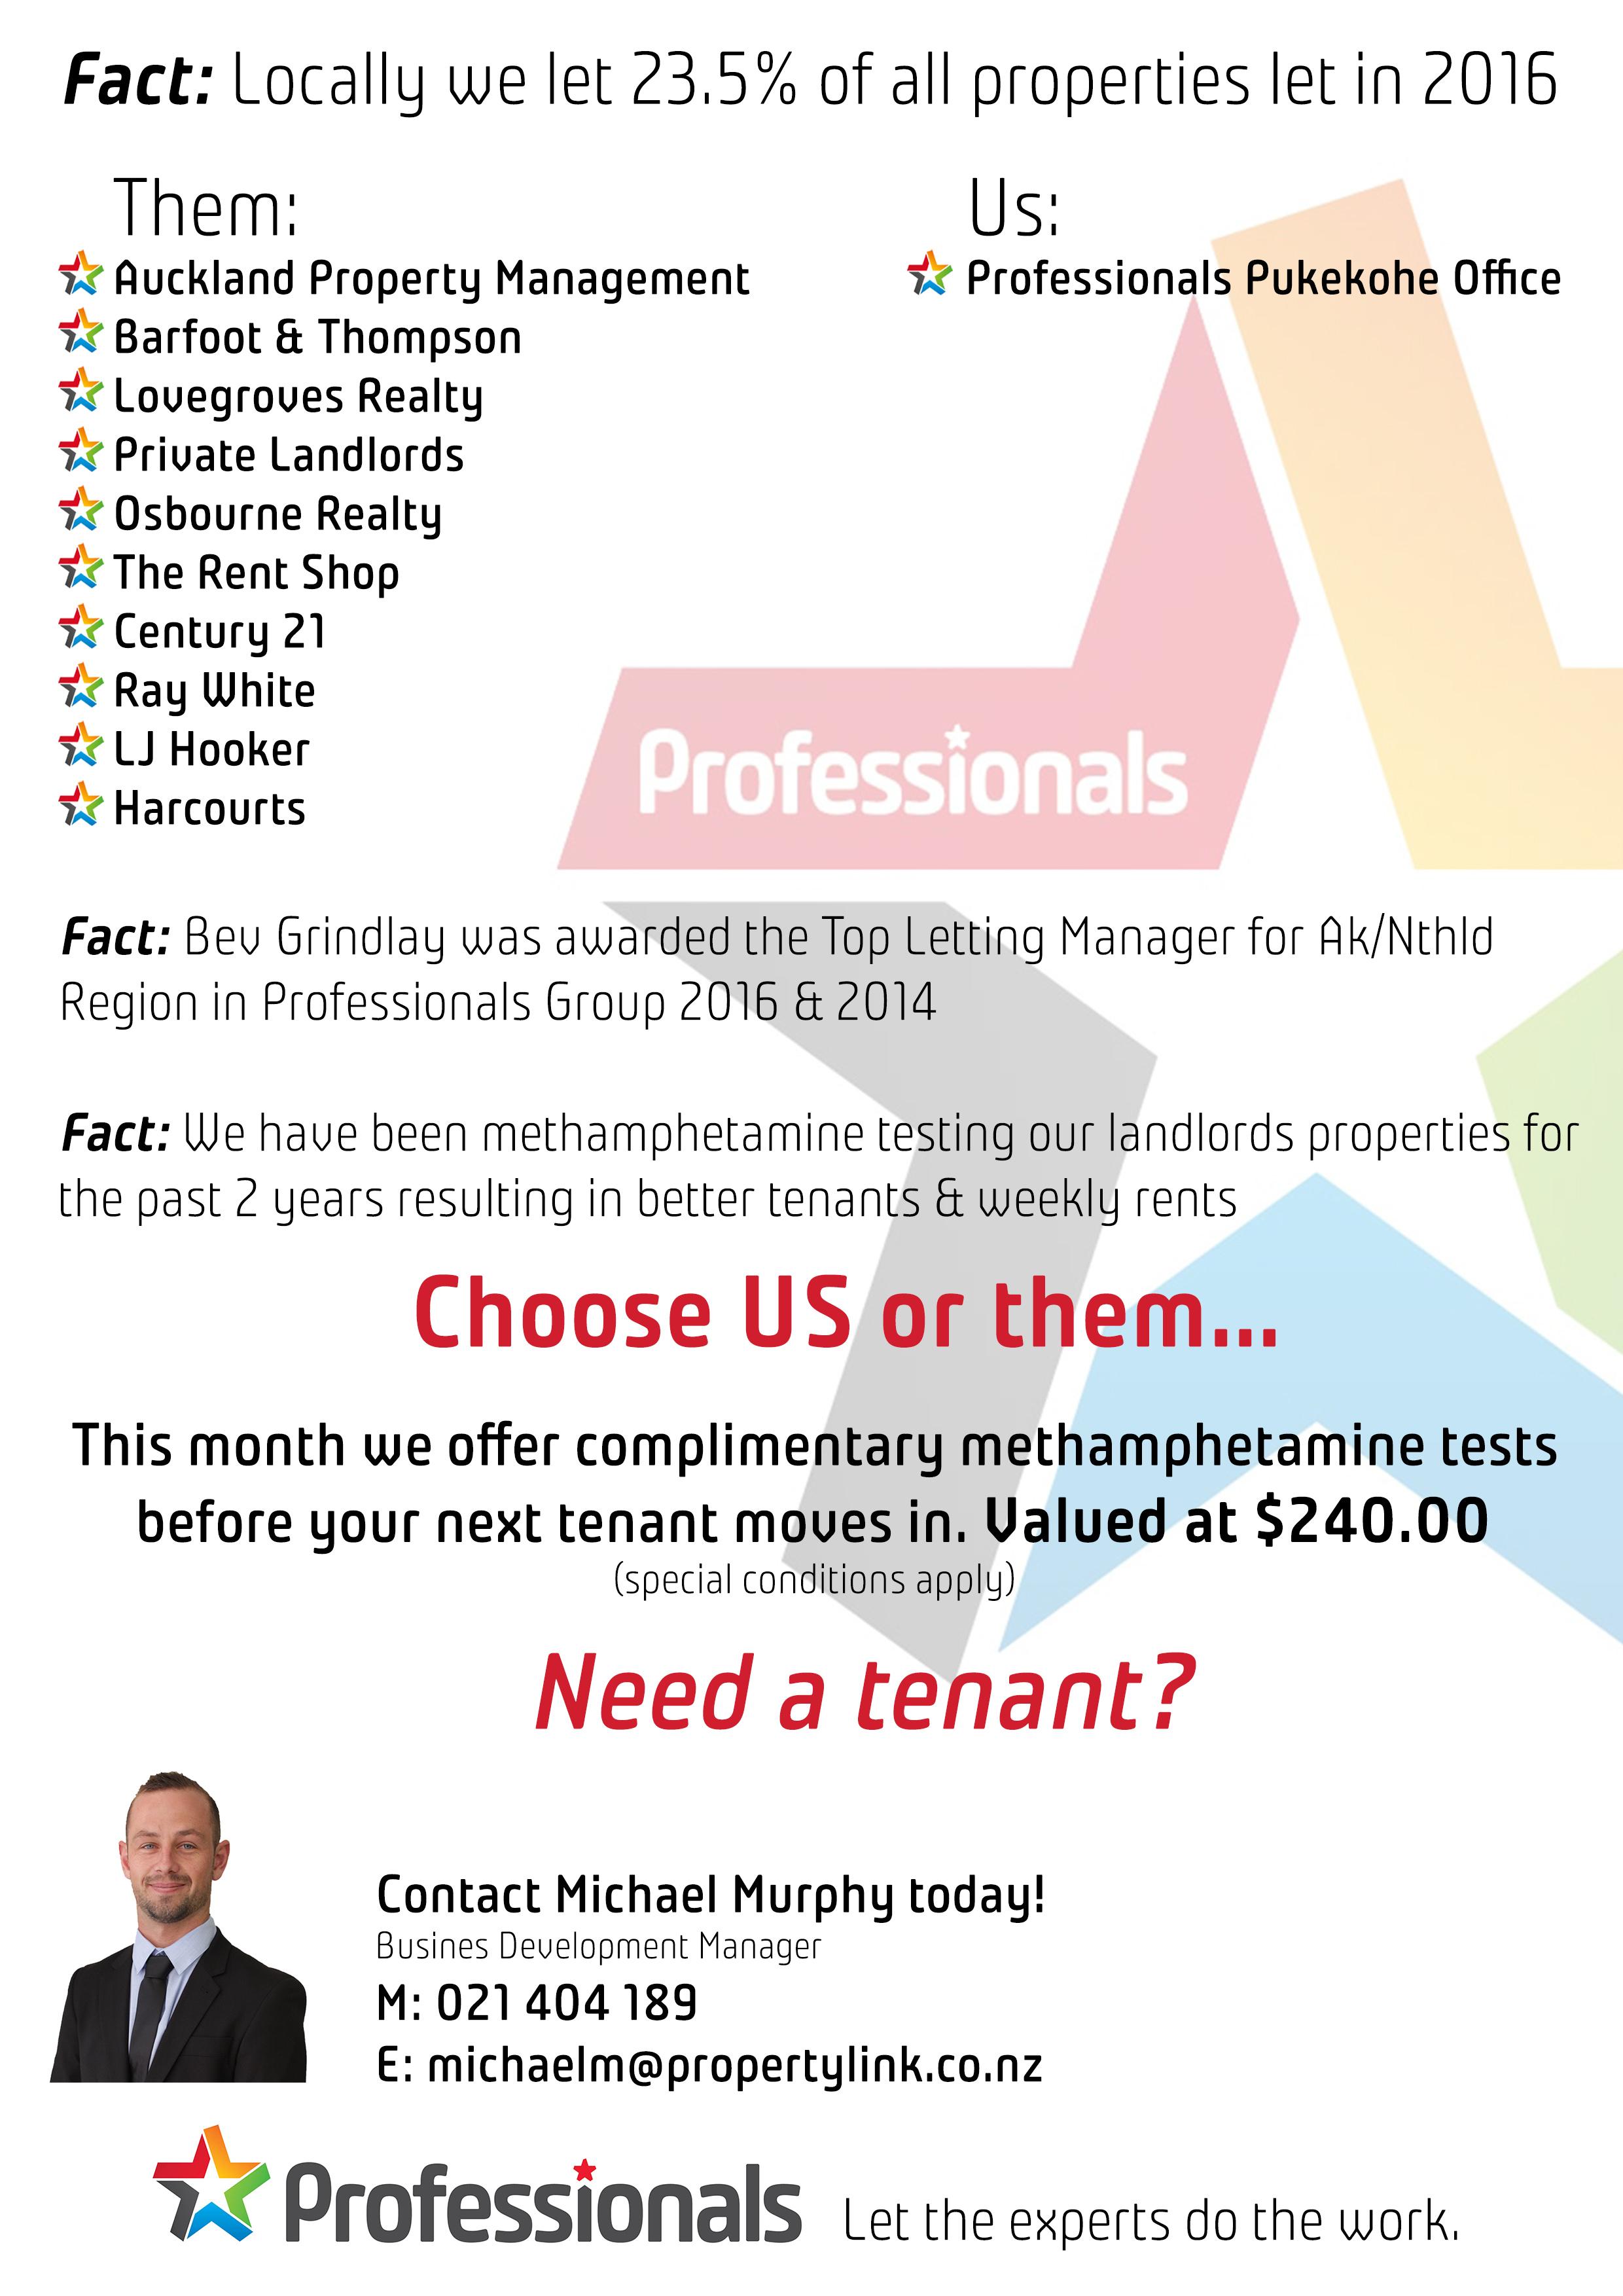 Choose us or them flyer - michael